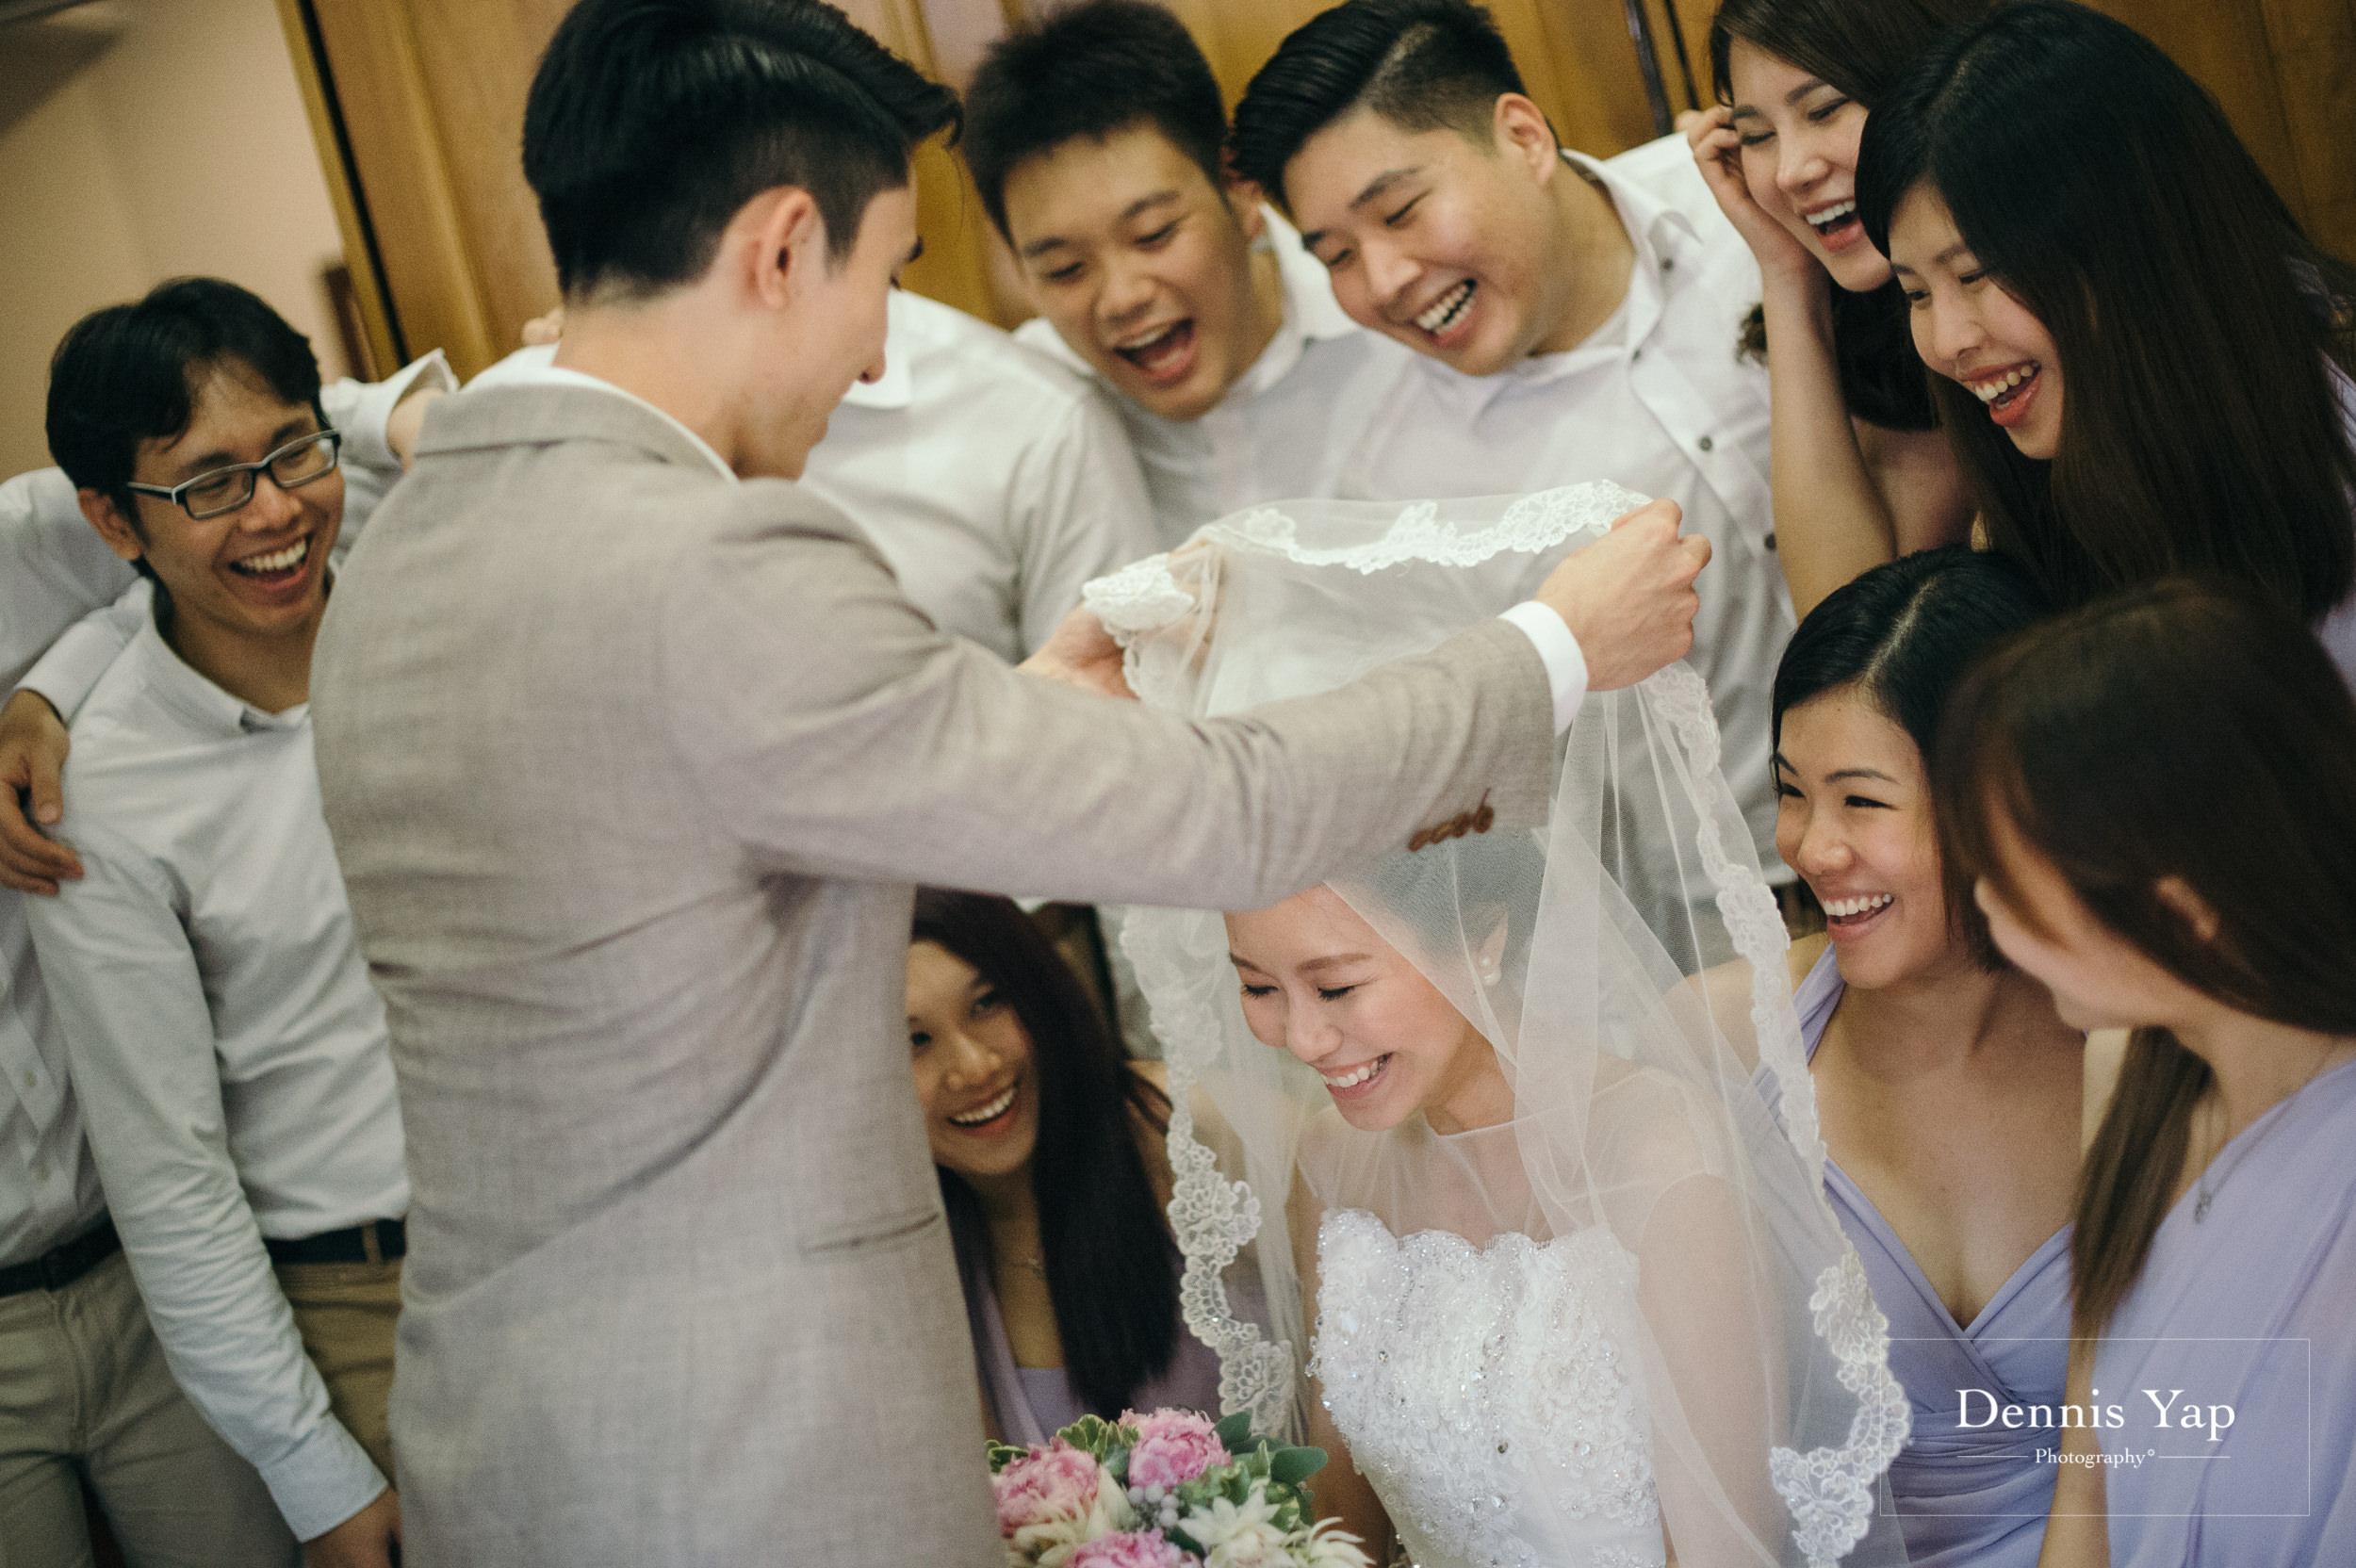 danny sherine wedding day group photo dennis yap photography usj heights malaysia top wedding photographer-9.jpg